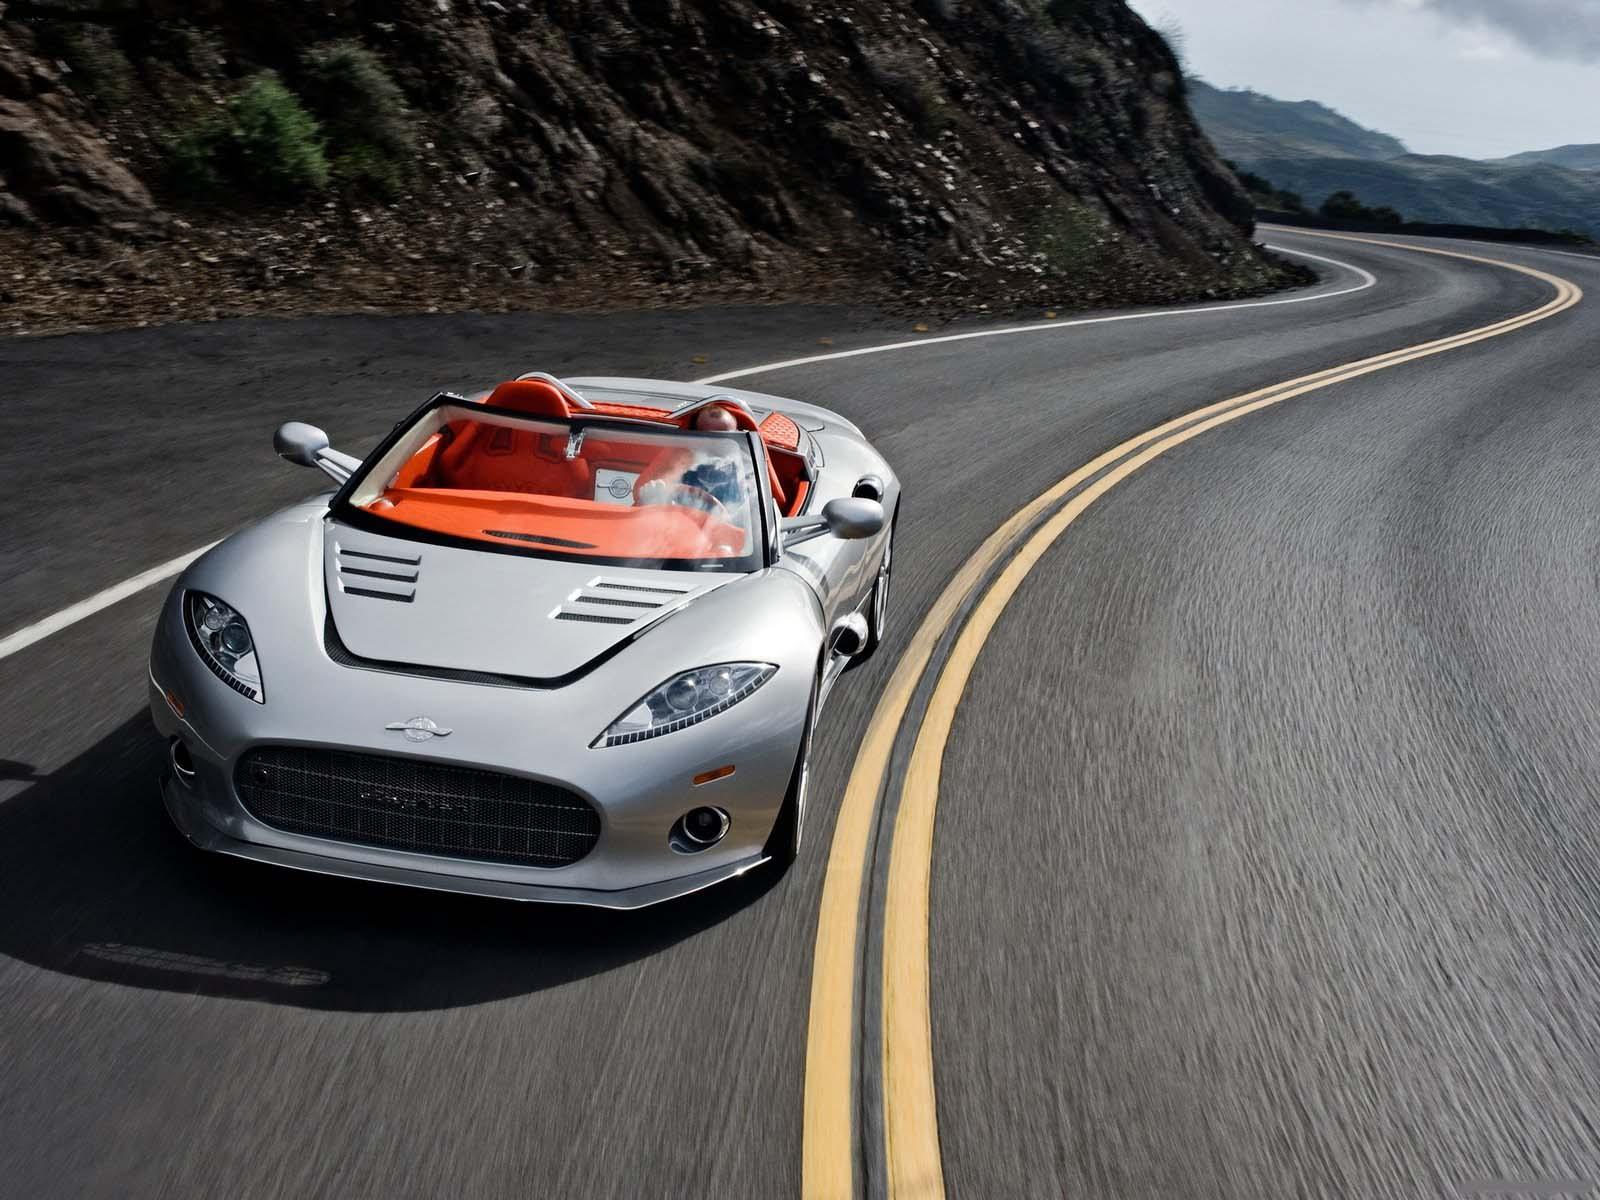 Sport Cars Spyker C8 Aileron Spyder 2010 Nice Car